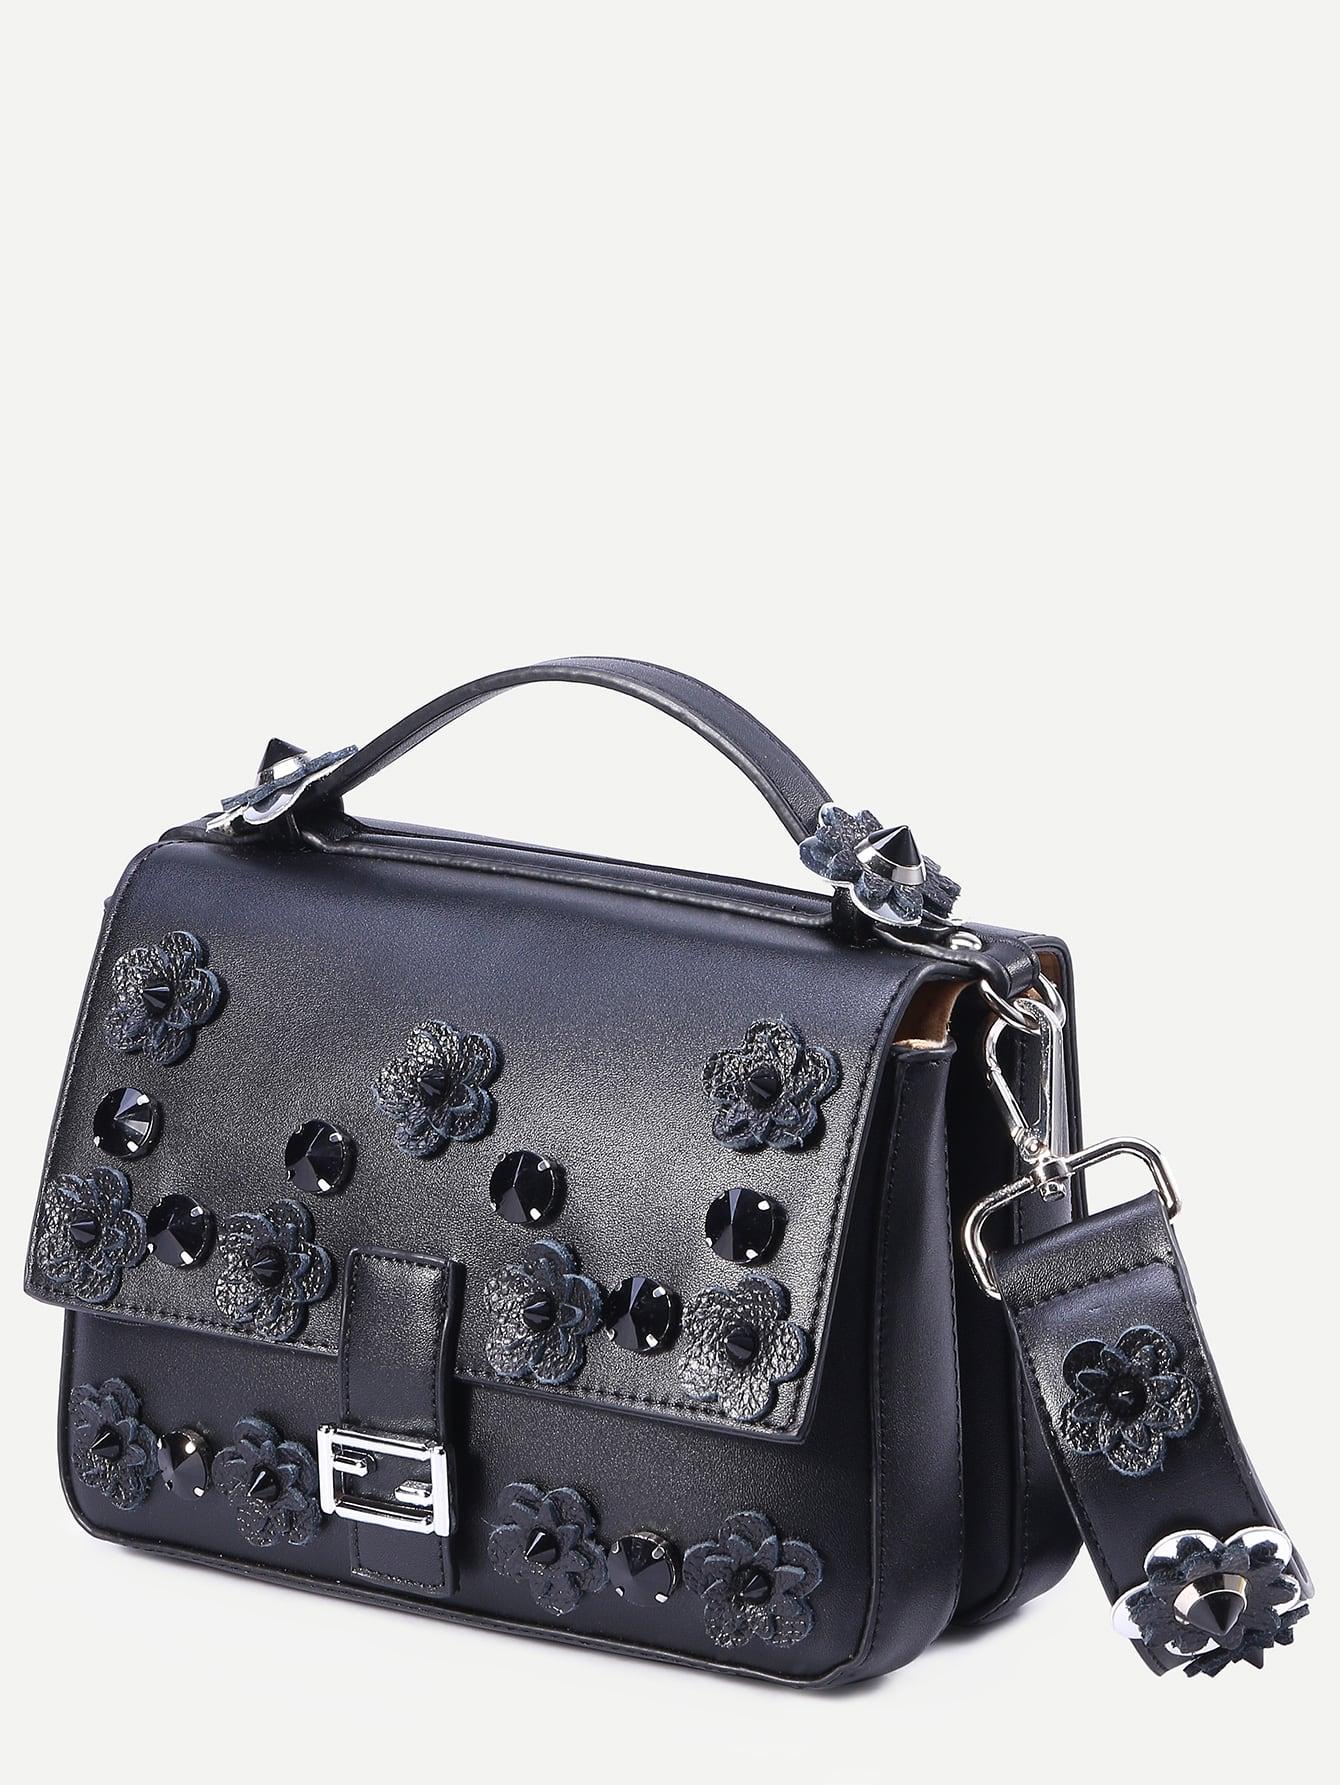 bag160822916_2